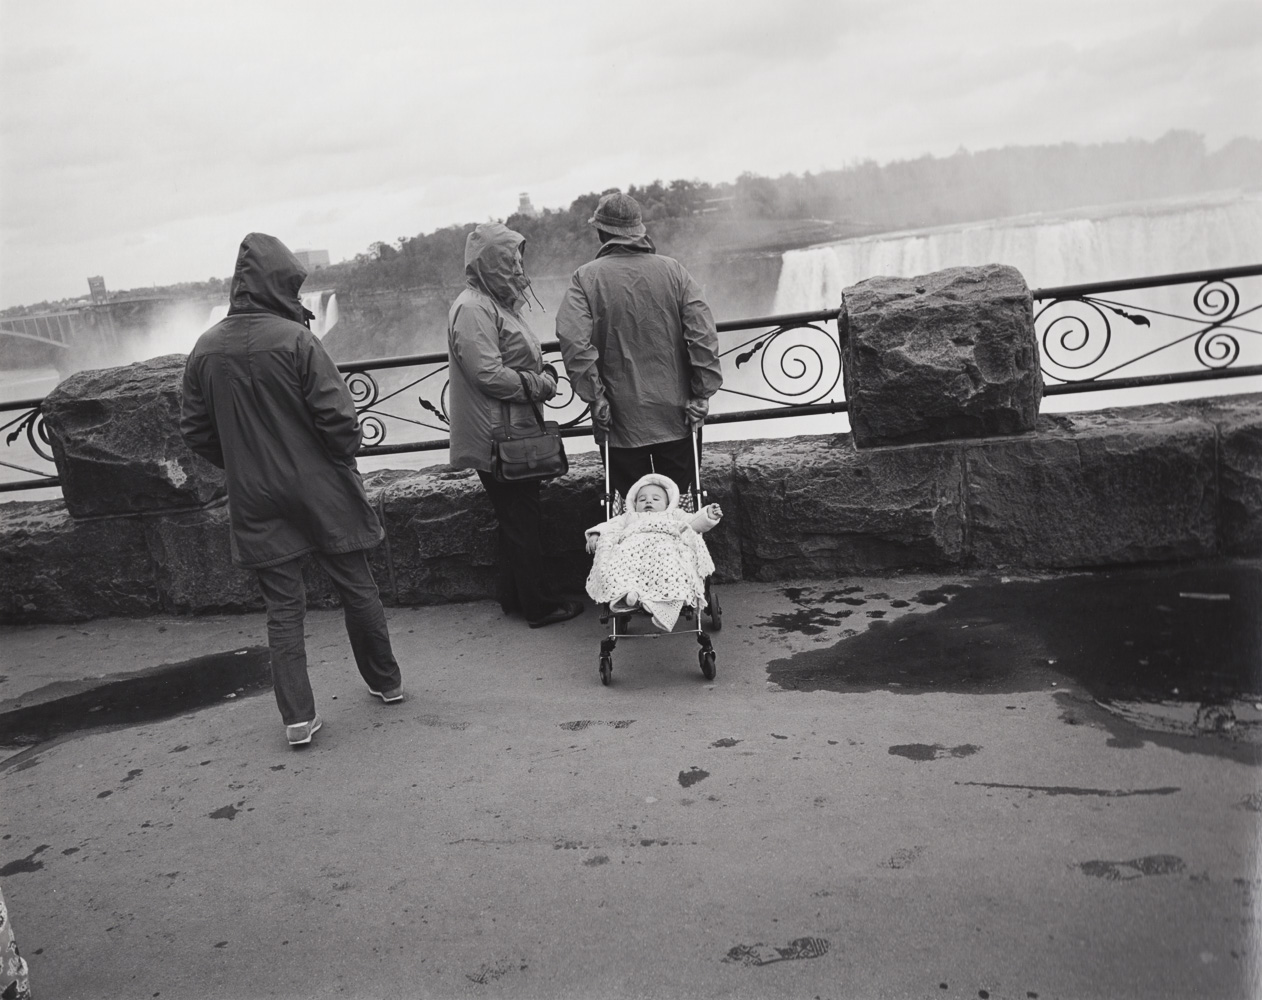 NIAGARA FALLS, 1973